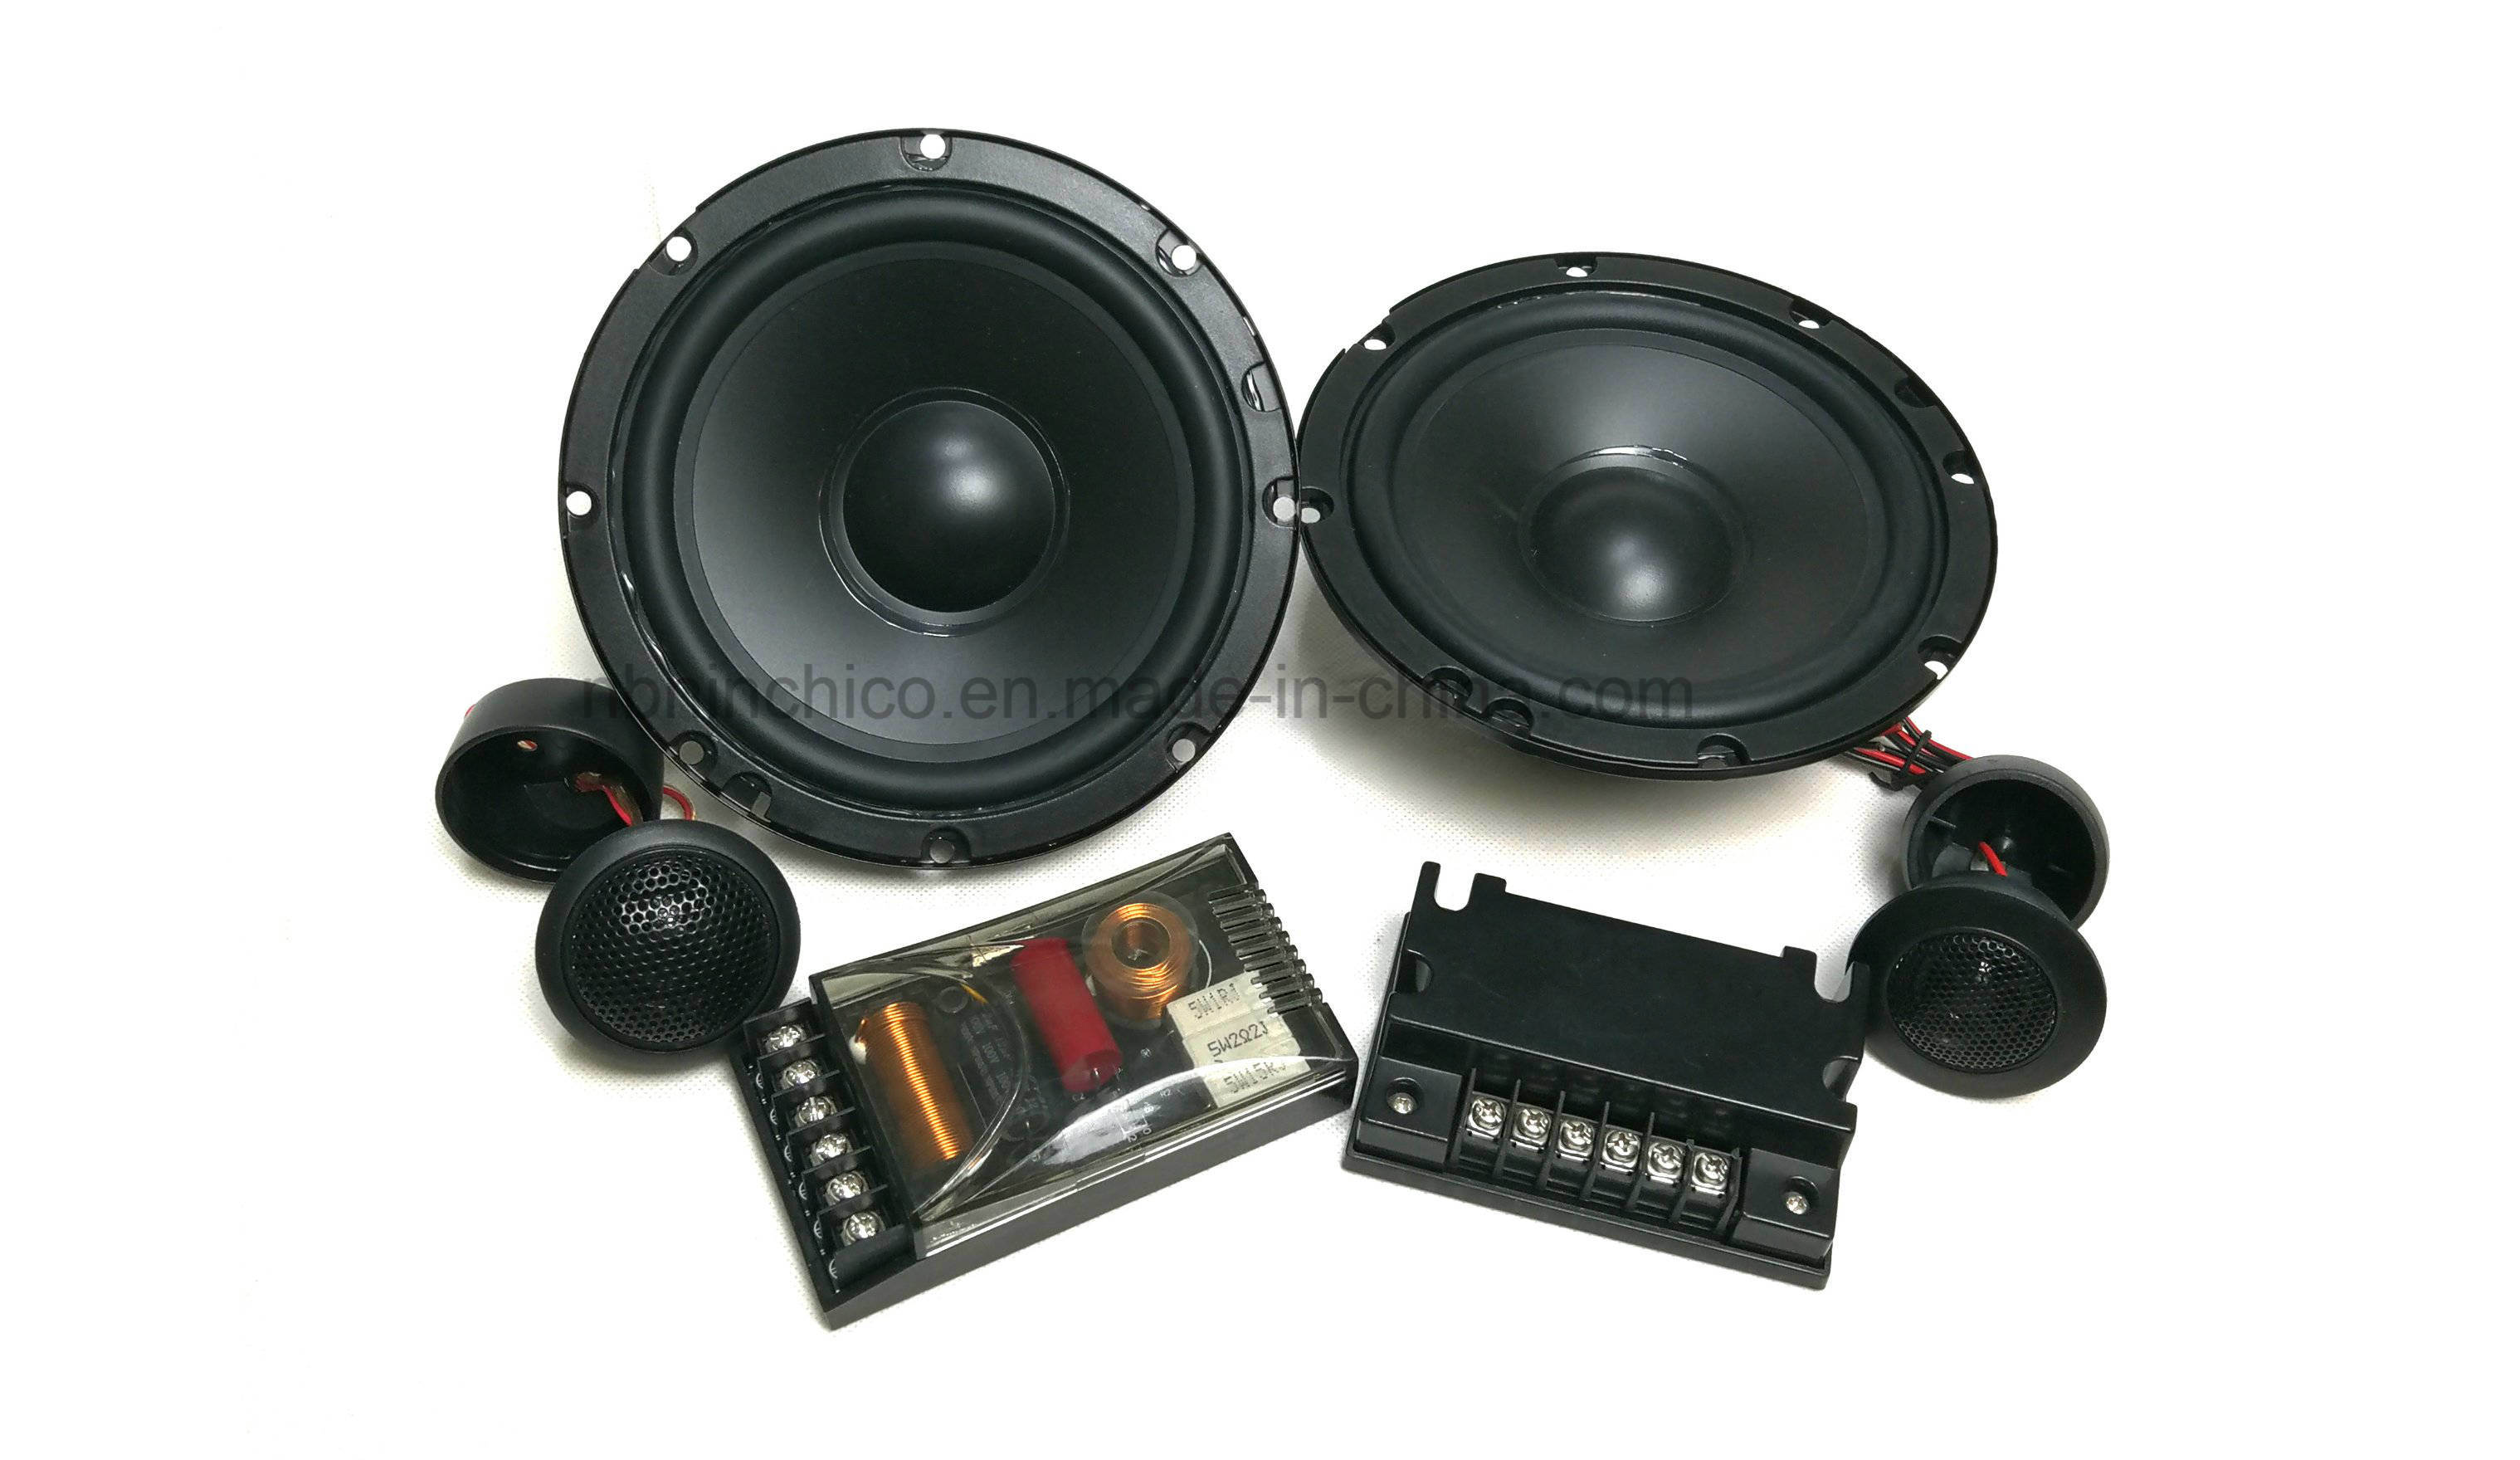 China 6 5 2 Way Best Sound System Powered Speaker Set For Car Speaker Componet Speaker X165 China Loudspeaker Car Speaker